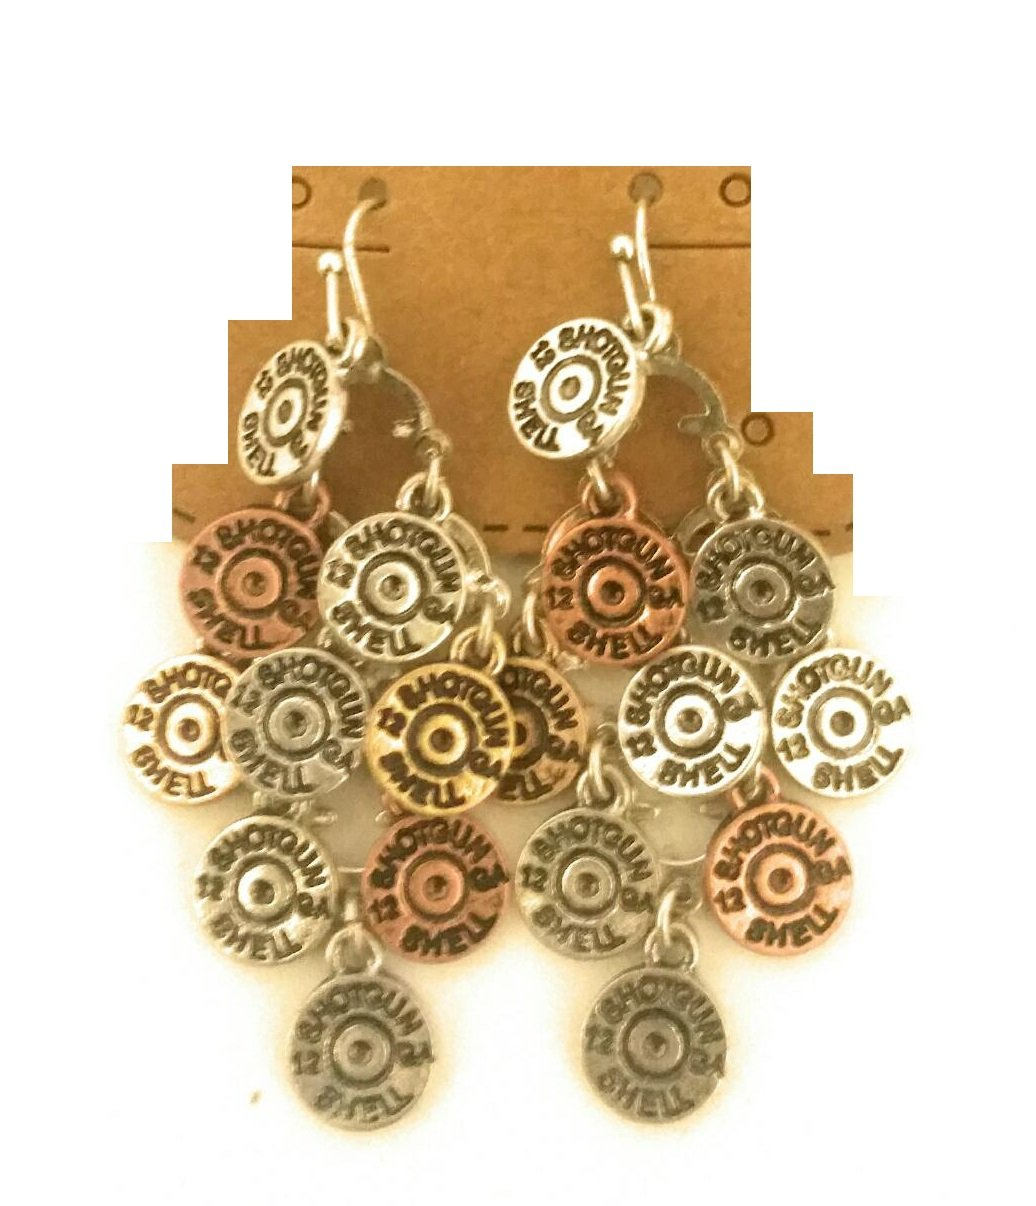 2 Inch Faux 12 GA Gauge Shotgun Shell Bullet Layered Cowgirl Earrings (Copper Gold Silver Tone)